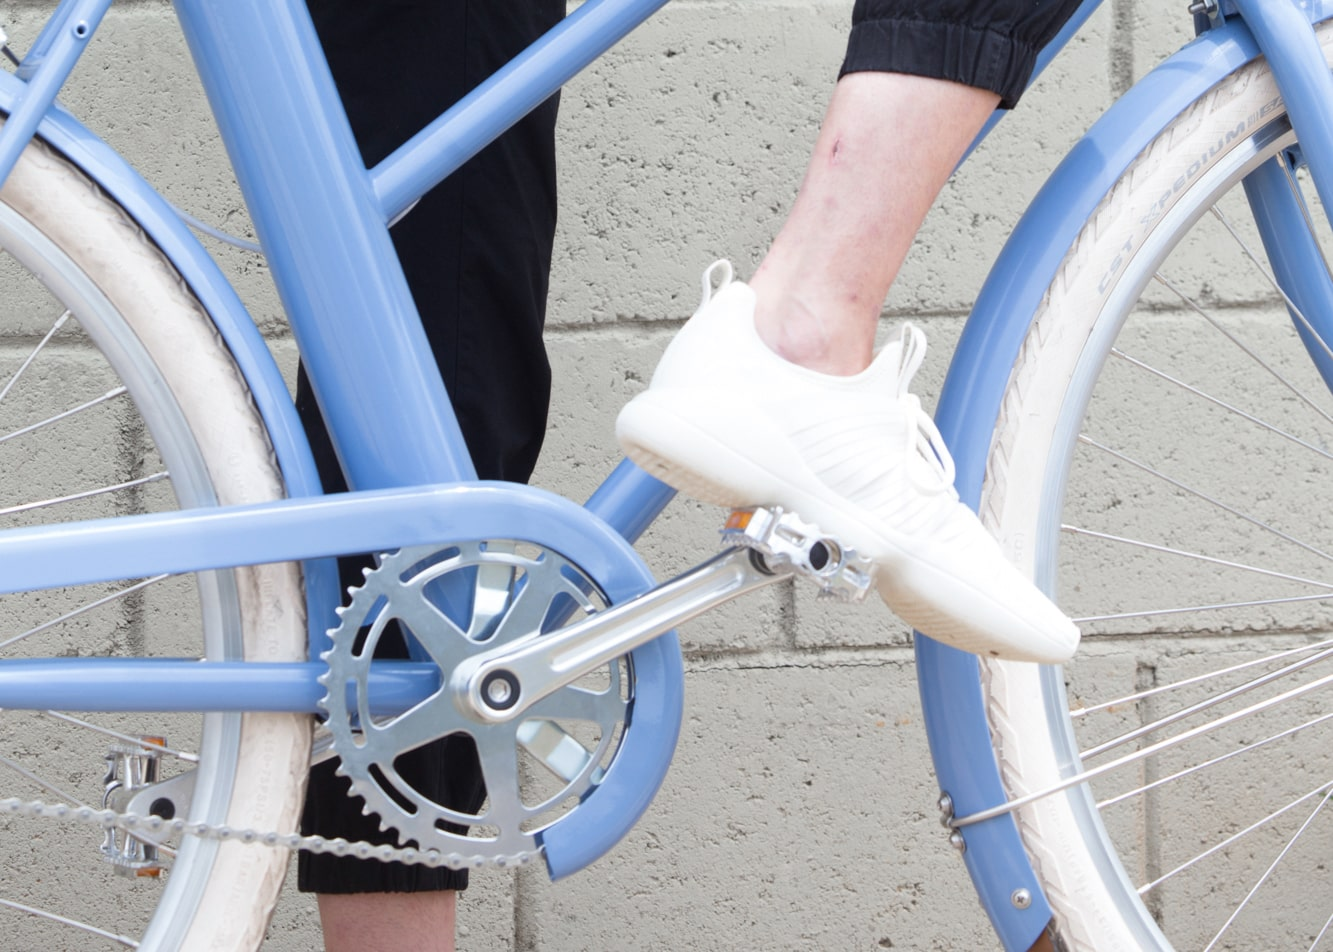 Sensor de pedal bike elétrica